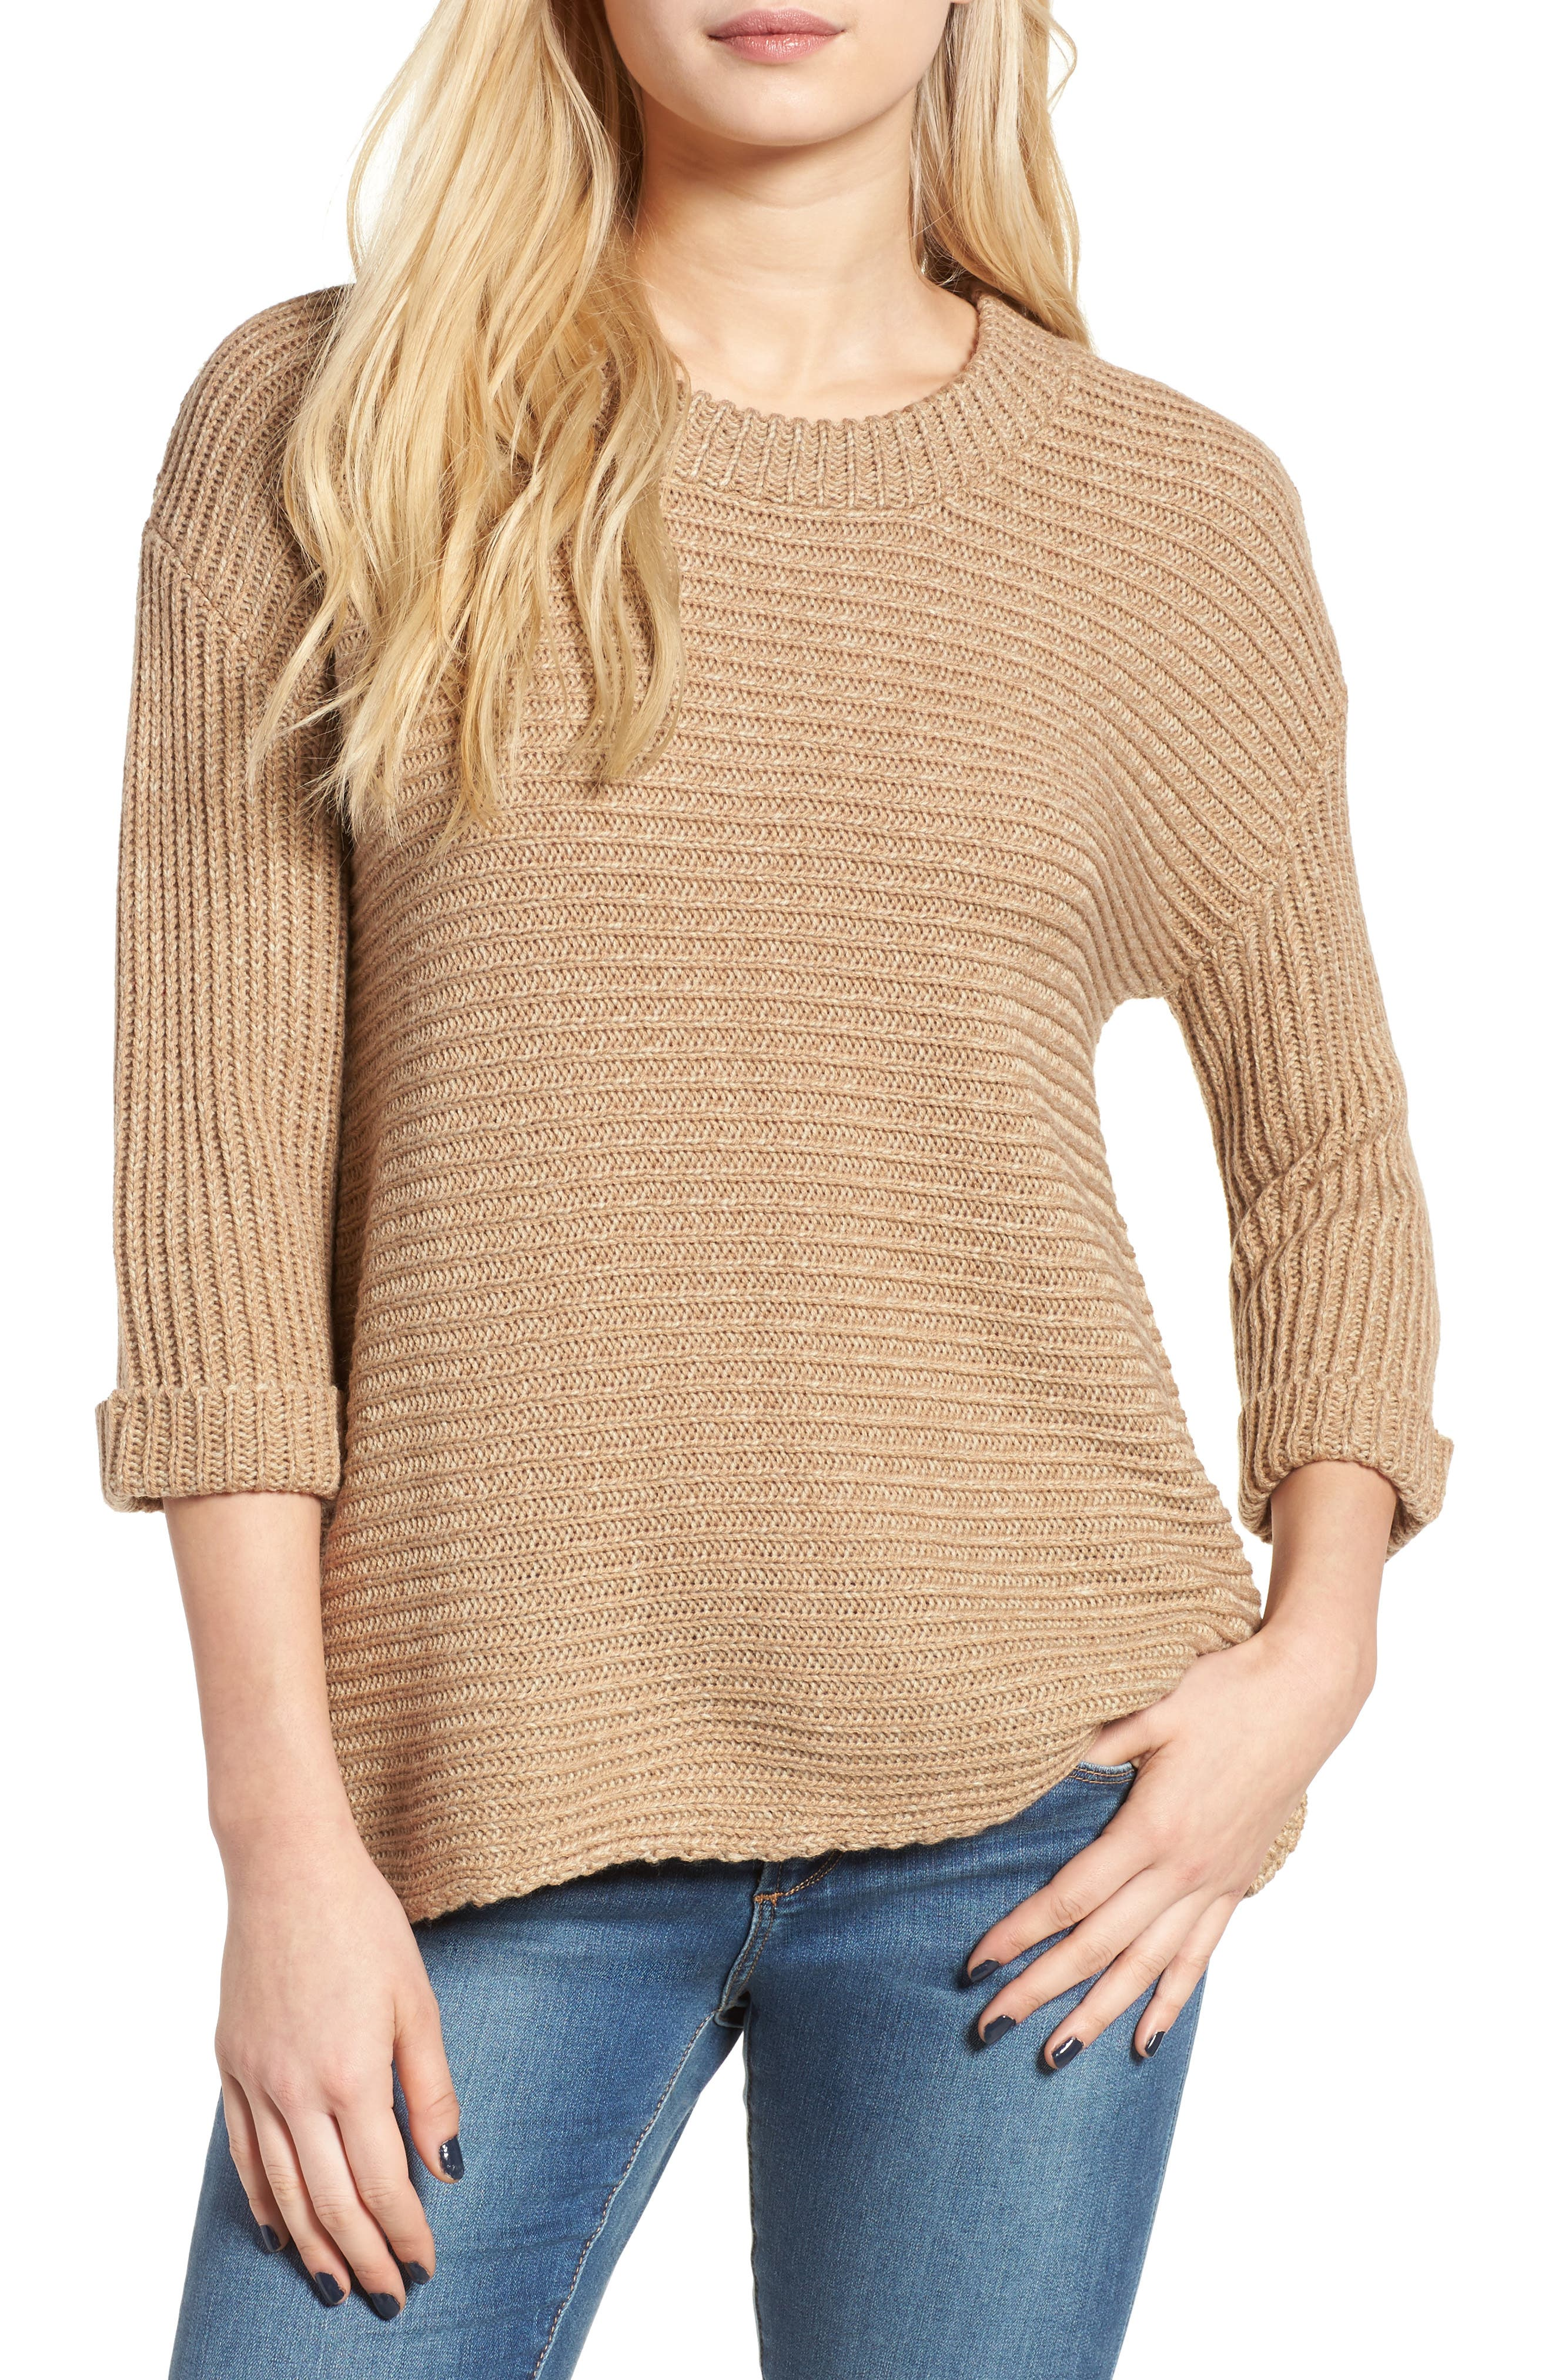 Main Image - Cotton Emporium Texture Knit Pullover